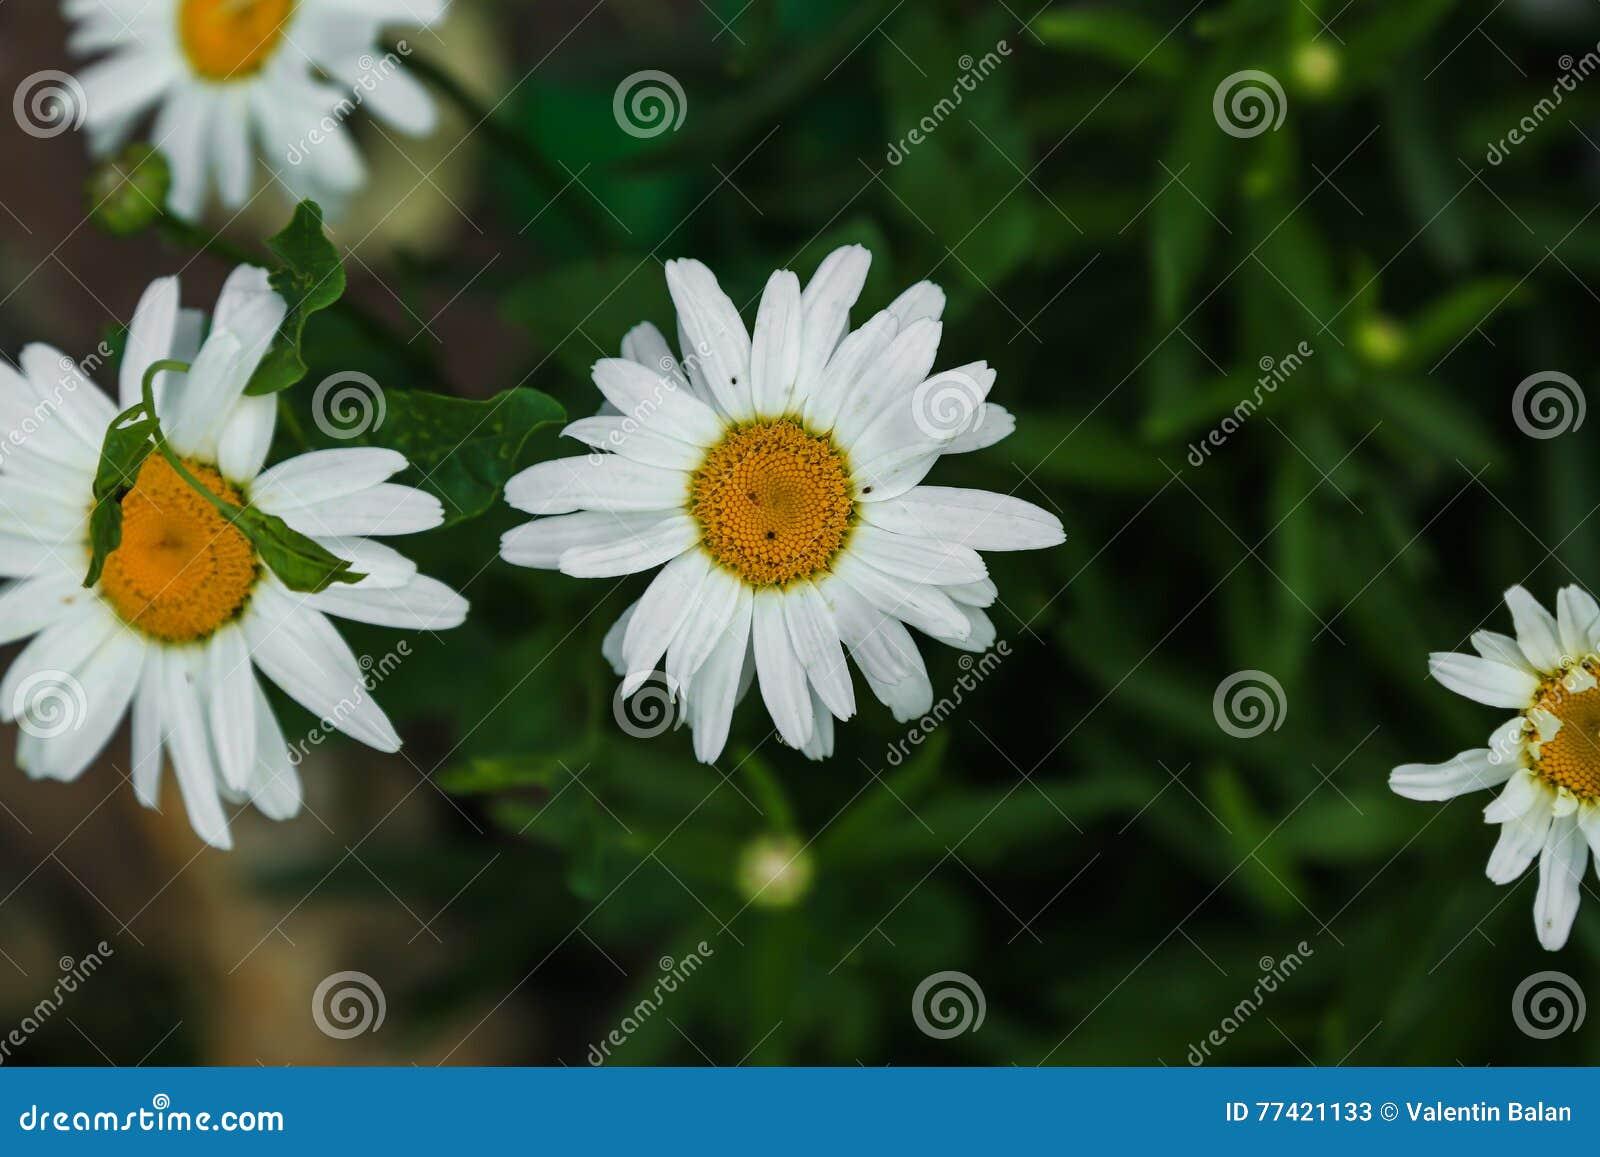 White daisy like chamomile flower stock image image of daisy download comp izmirmasajfo